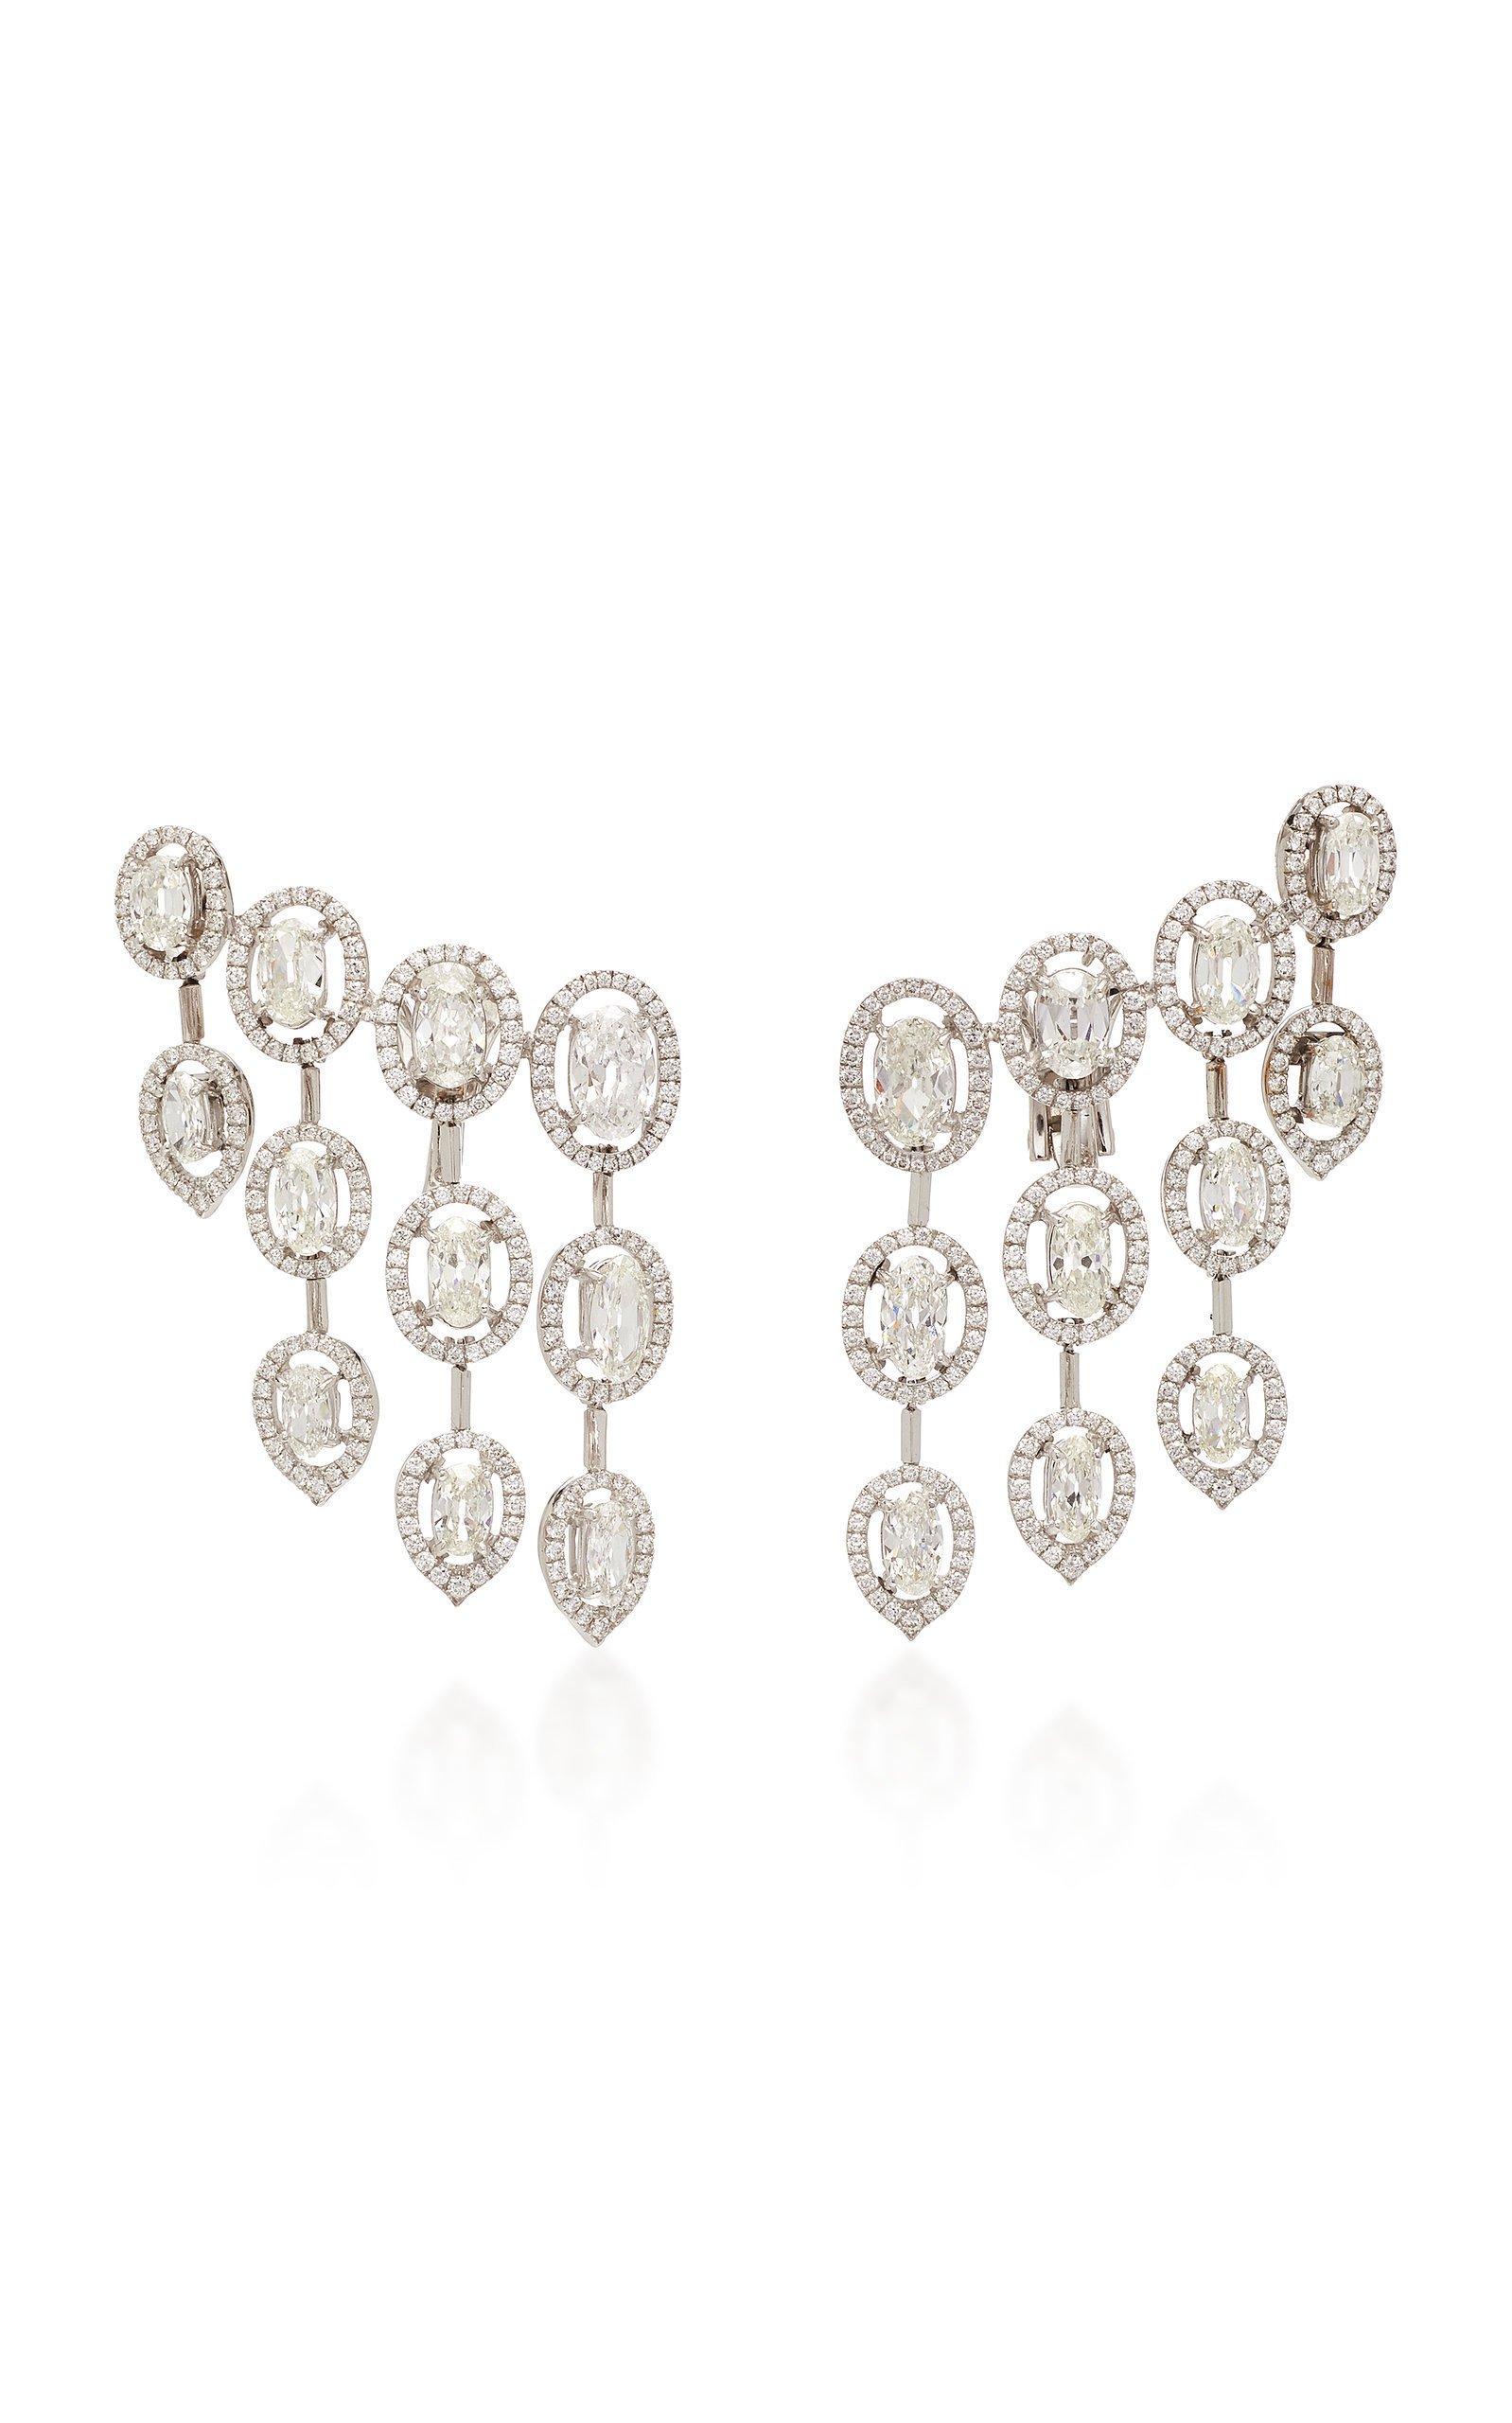 Busatti Oval Raindrop 18K White Gold And Diamond Earrings